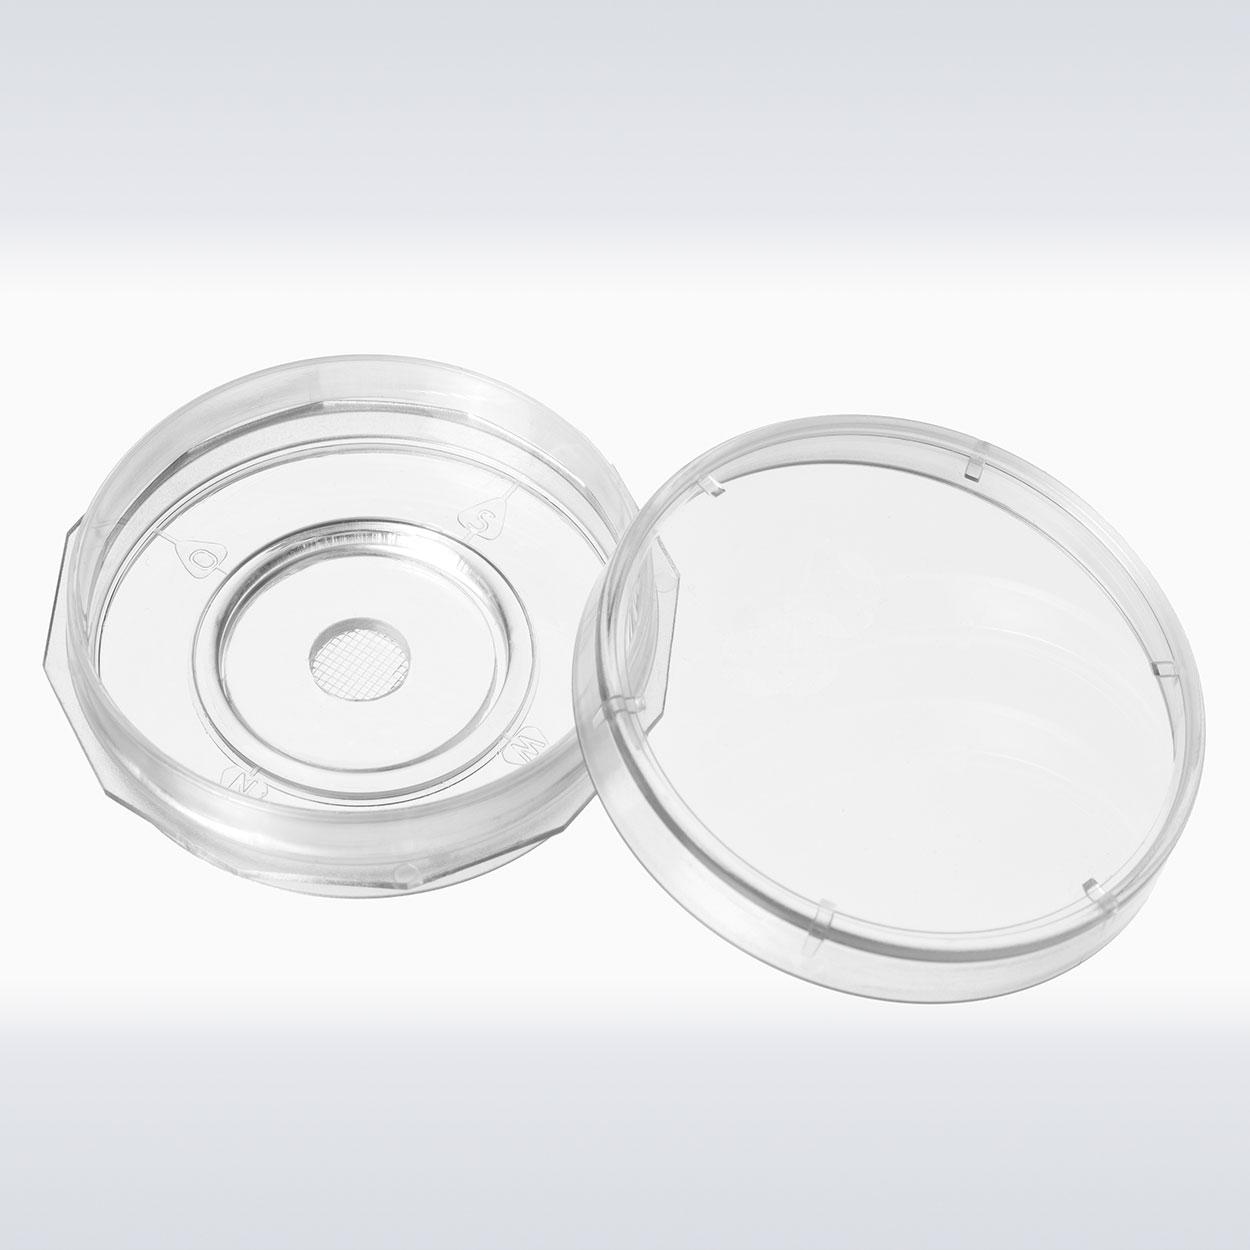 Imaging Dish